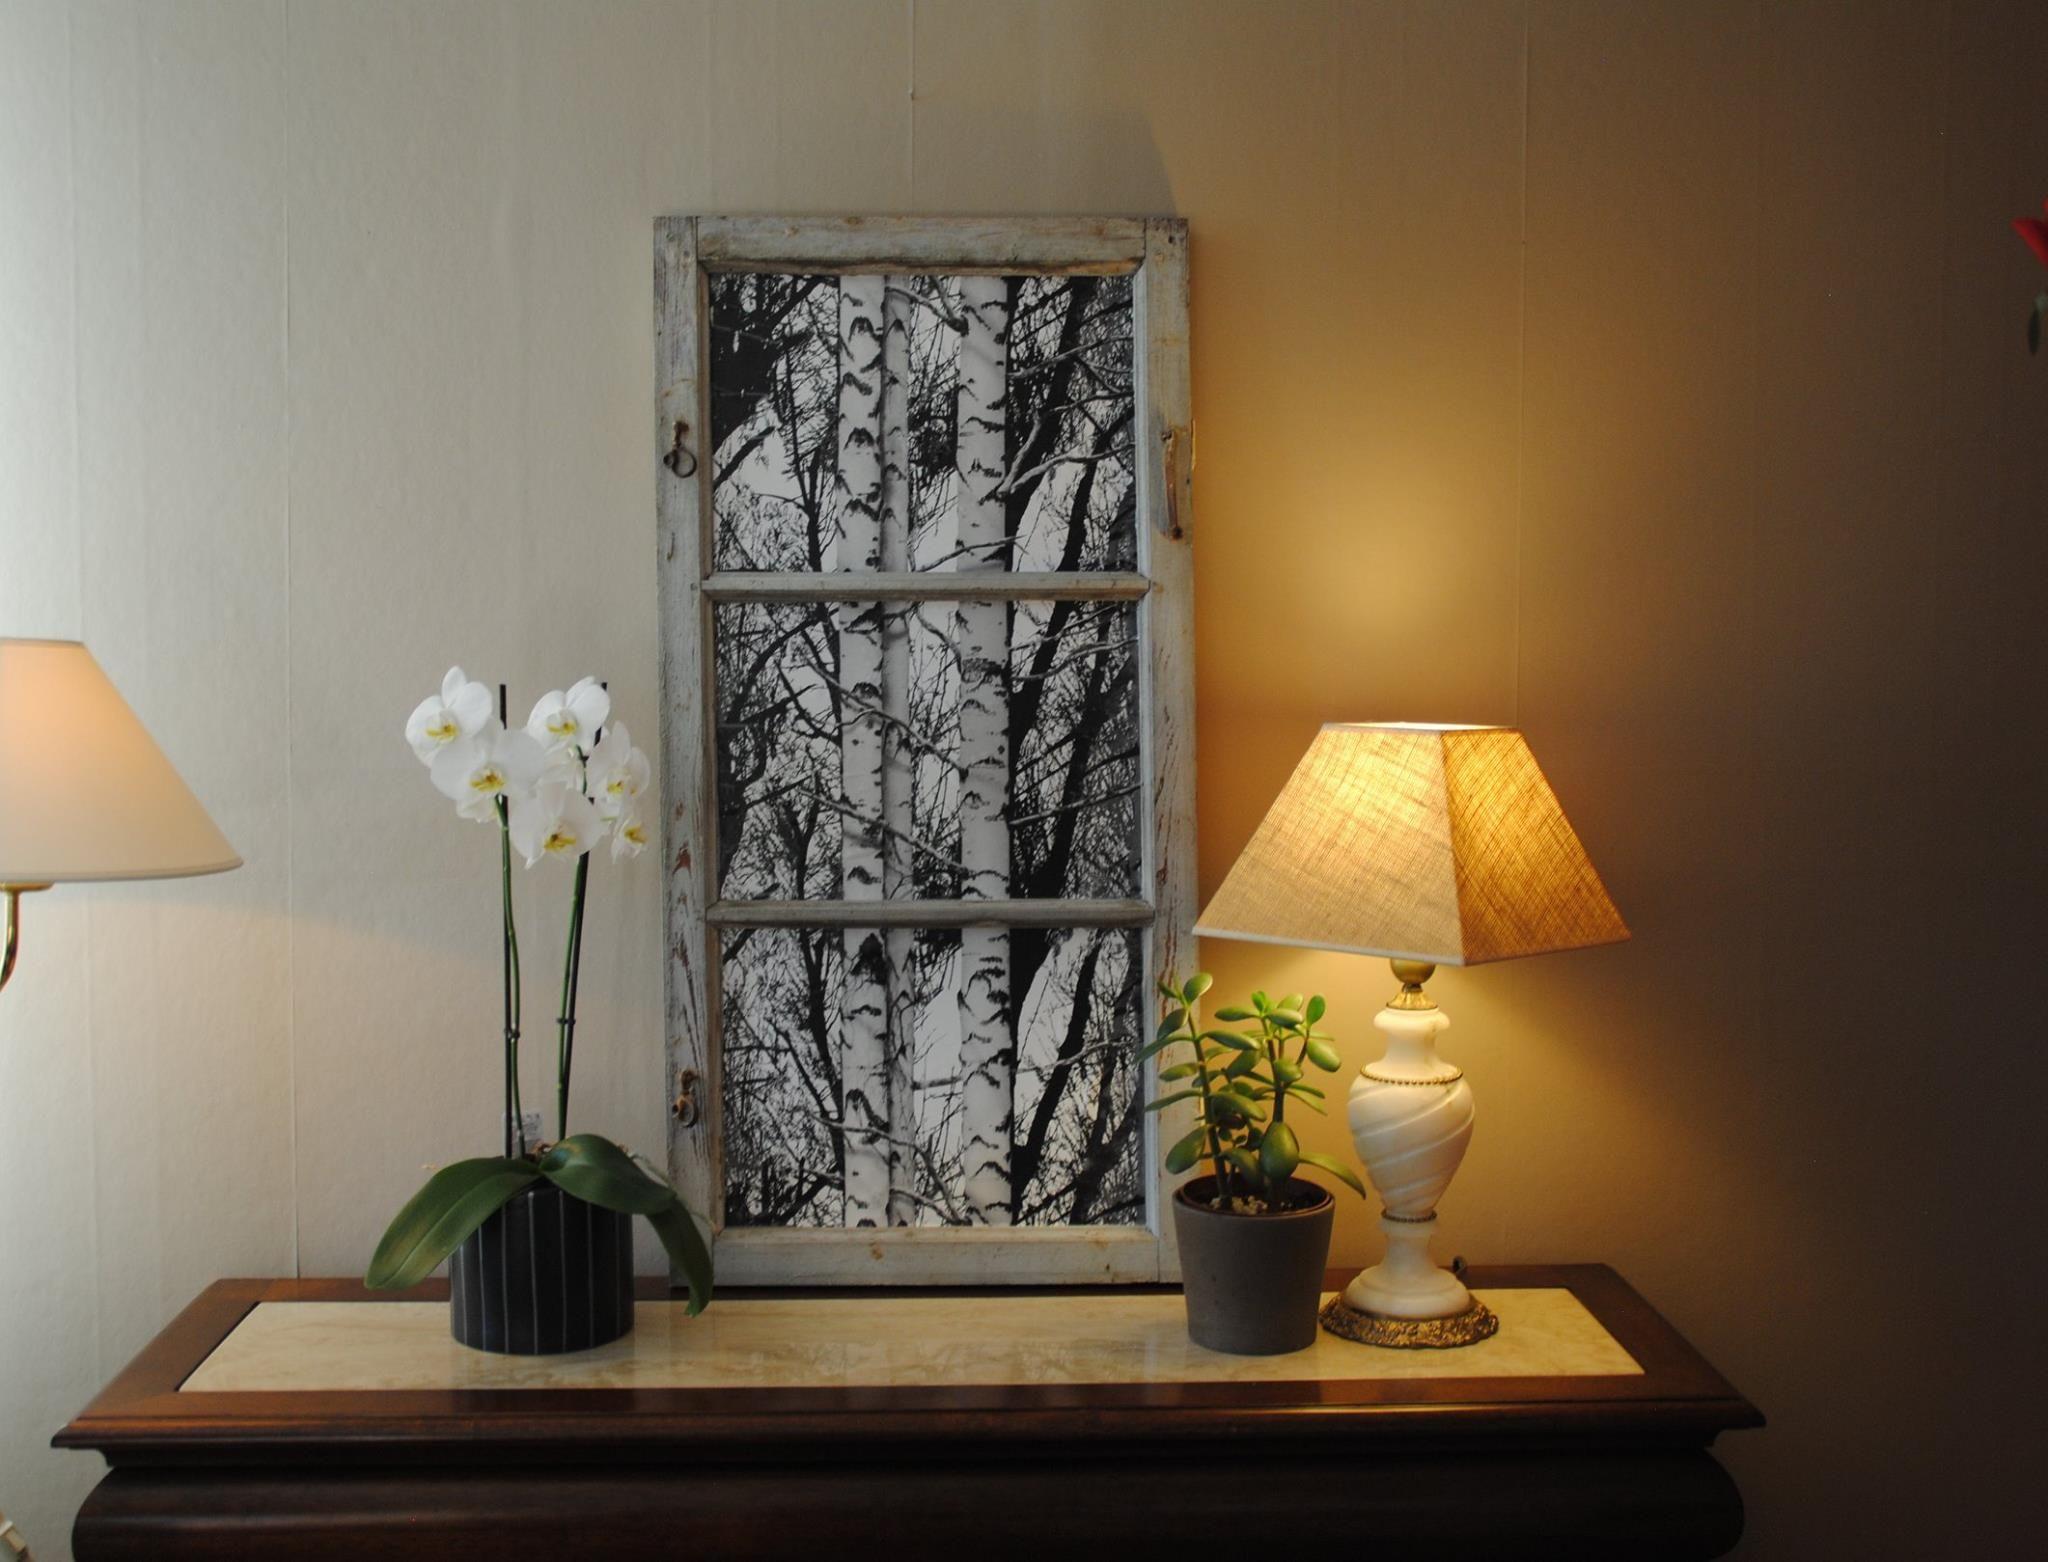 Vanha ikkuna koristeltu d-c fix:llä